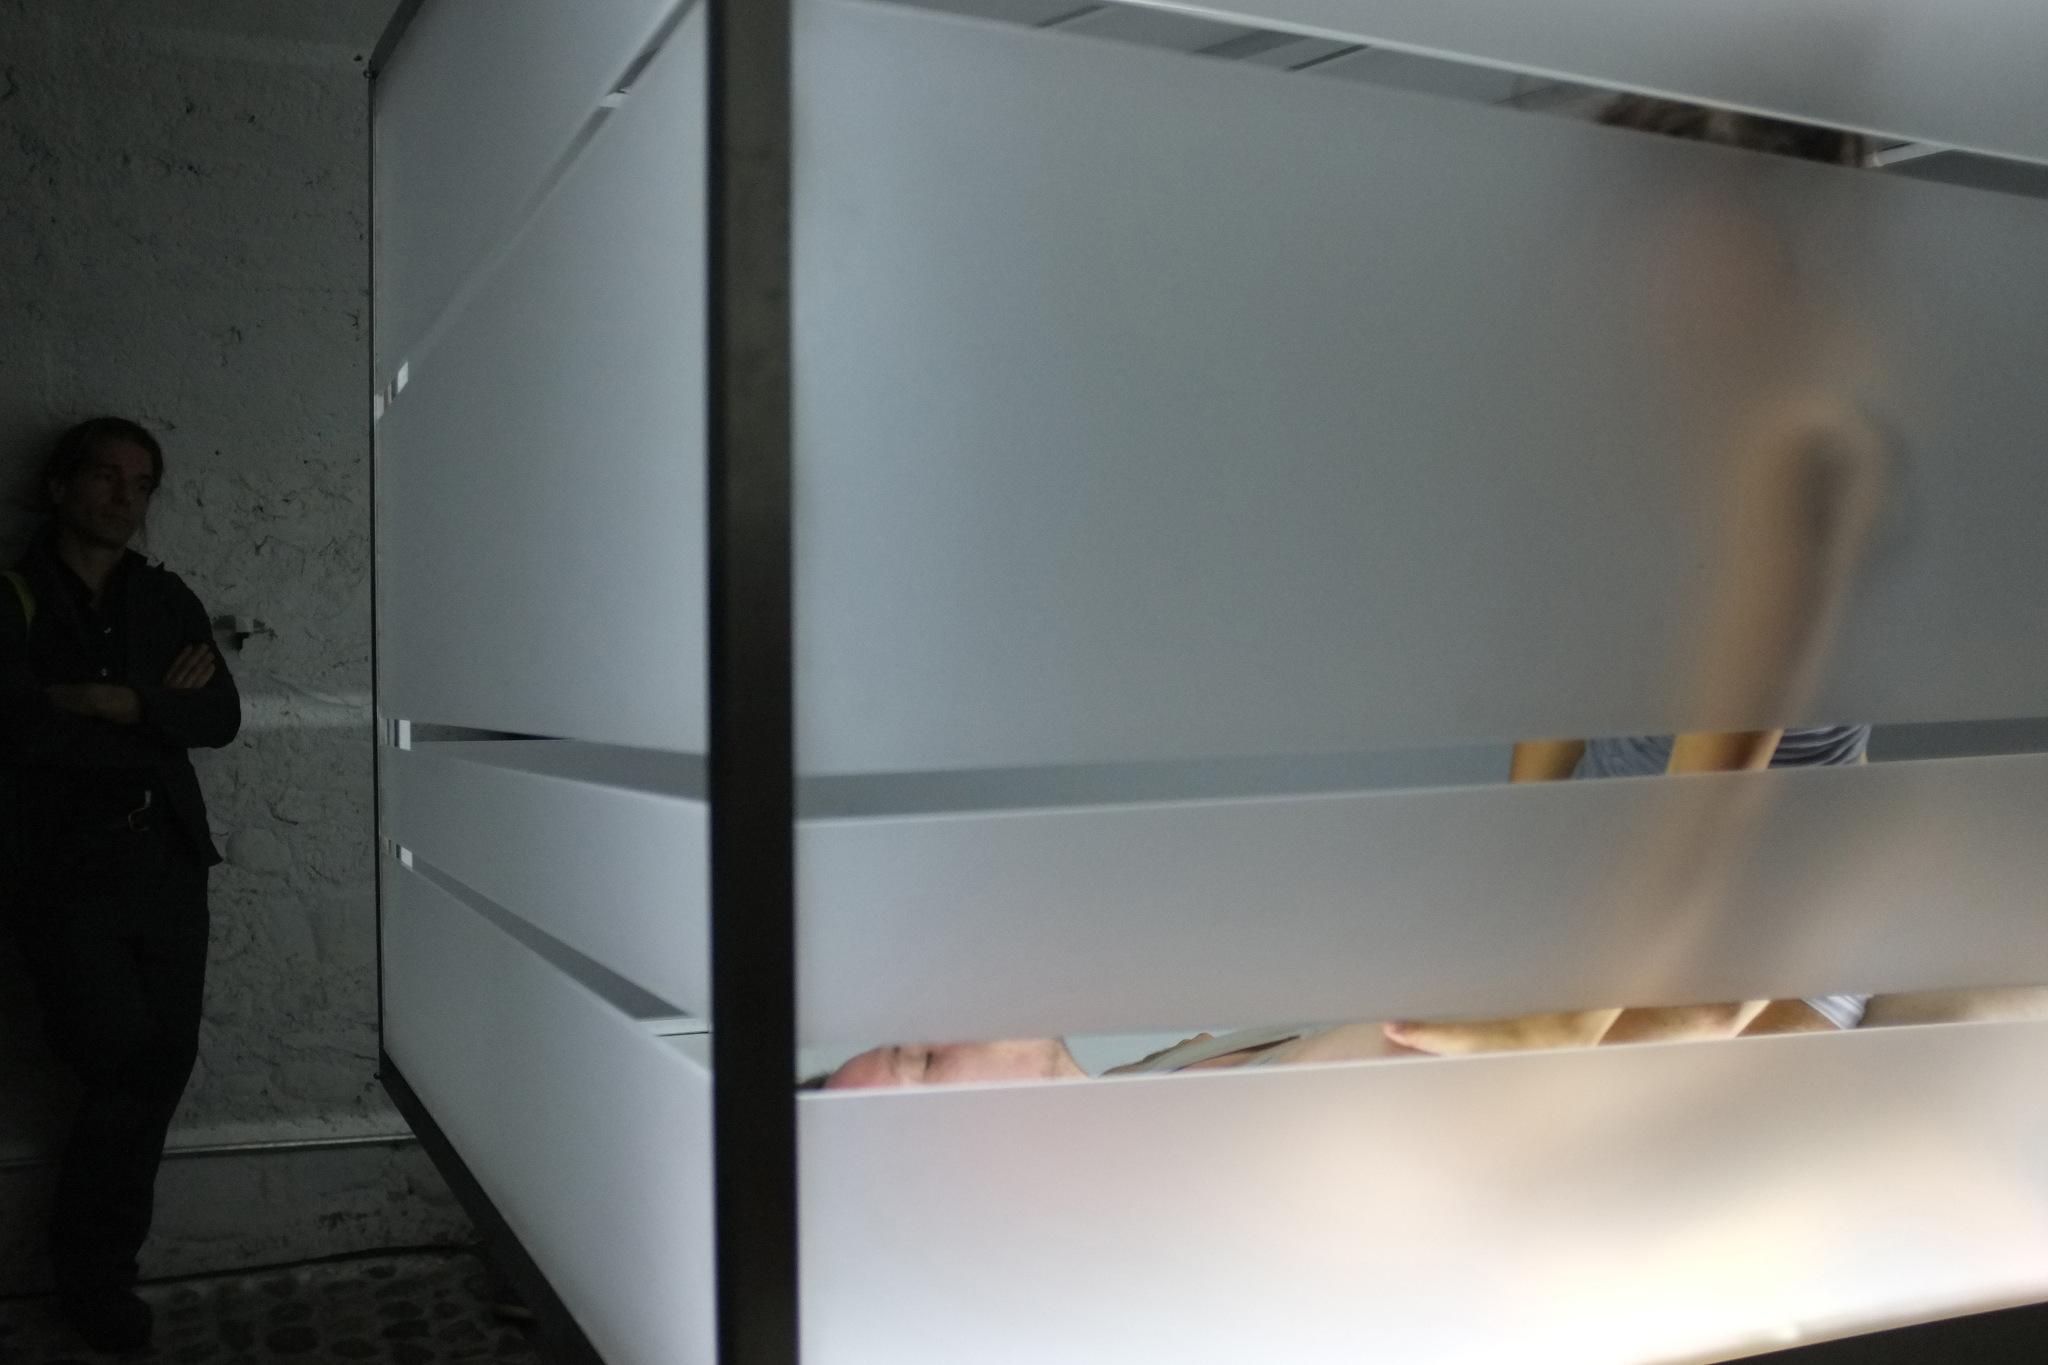 280912_underground_caveaustmartin_cm13-prototype-status-celine-michel-web